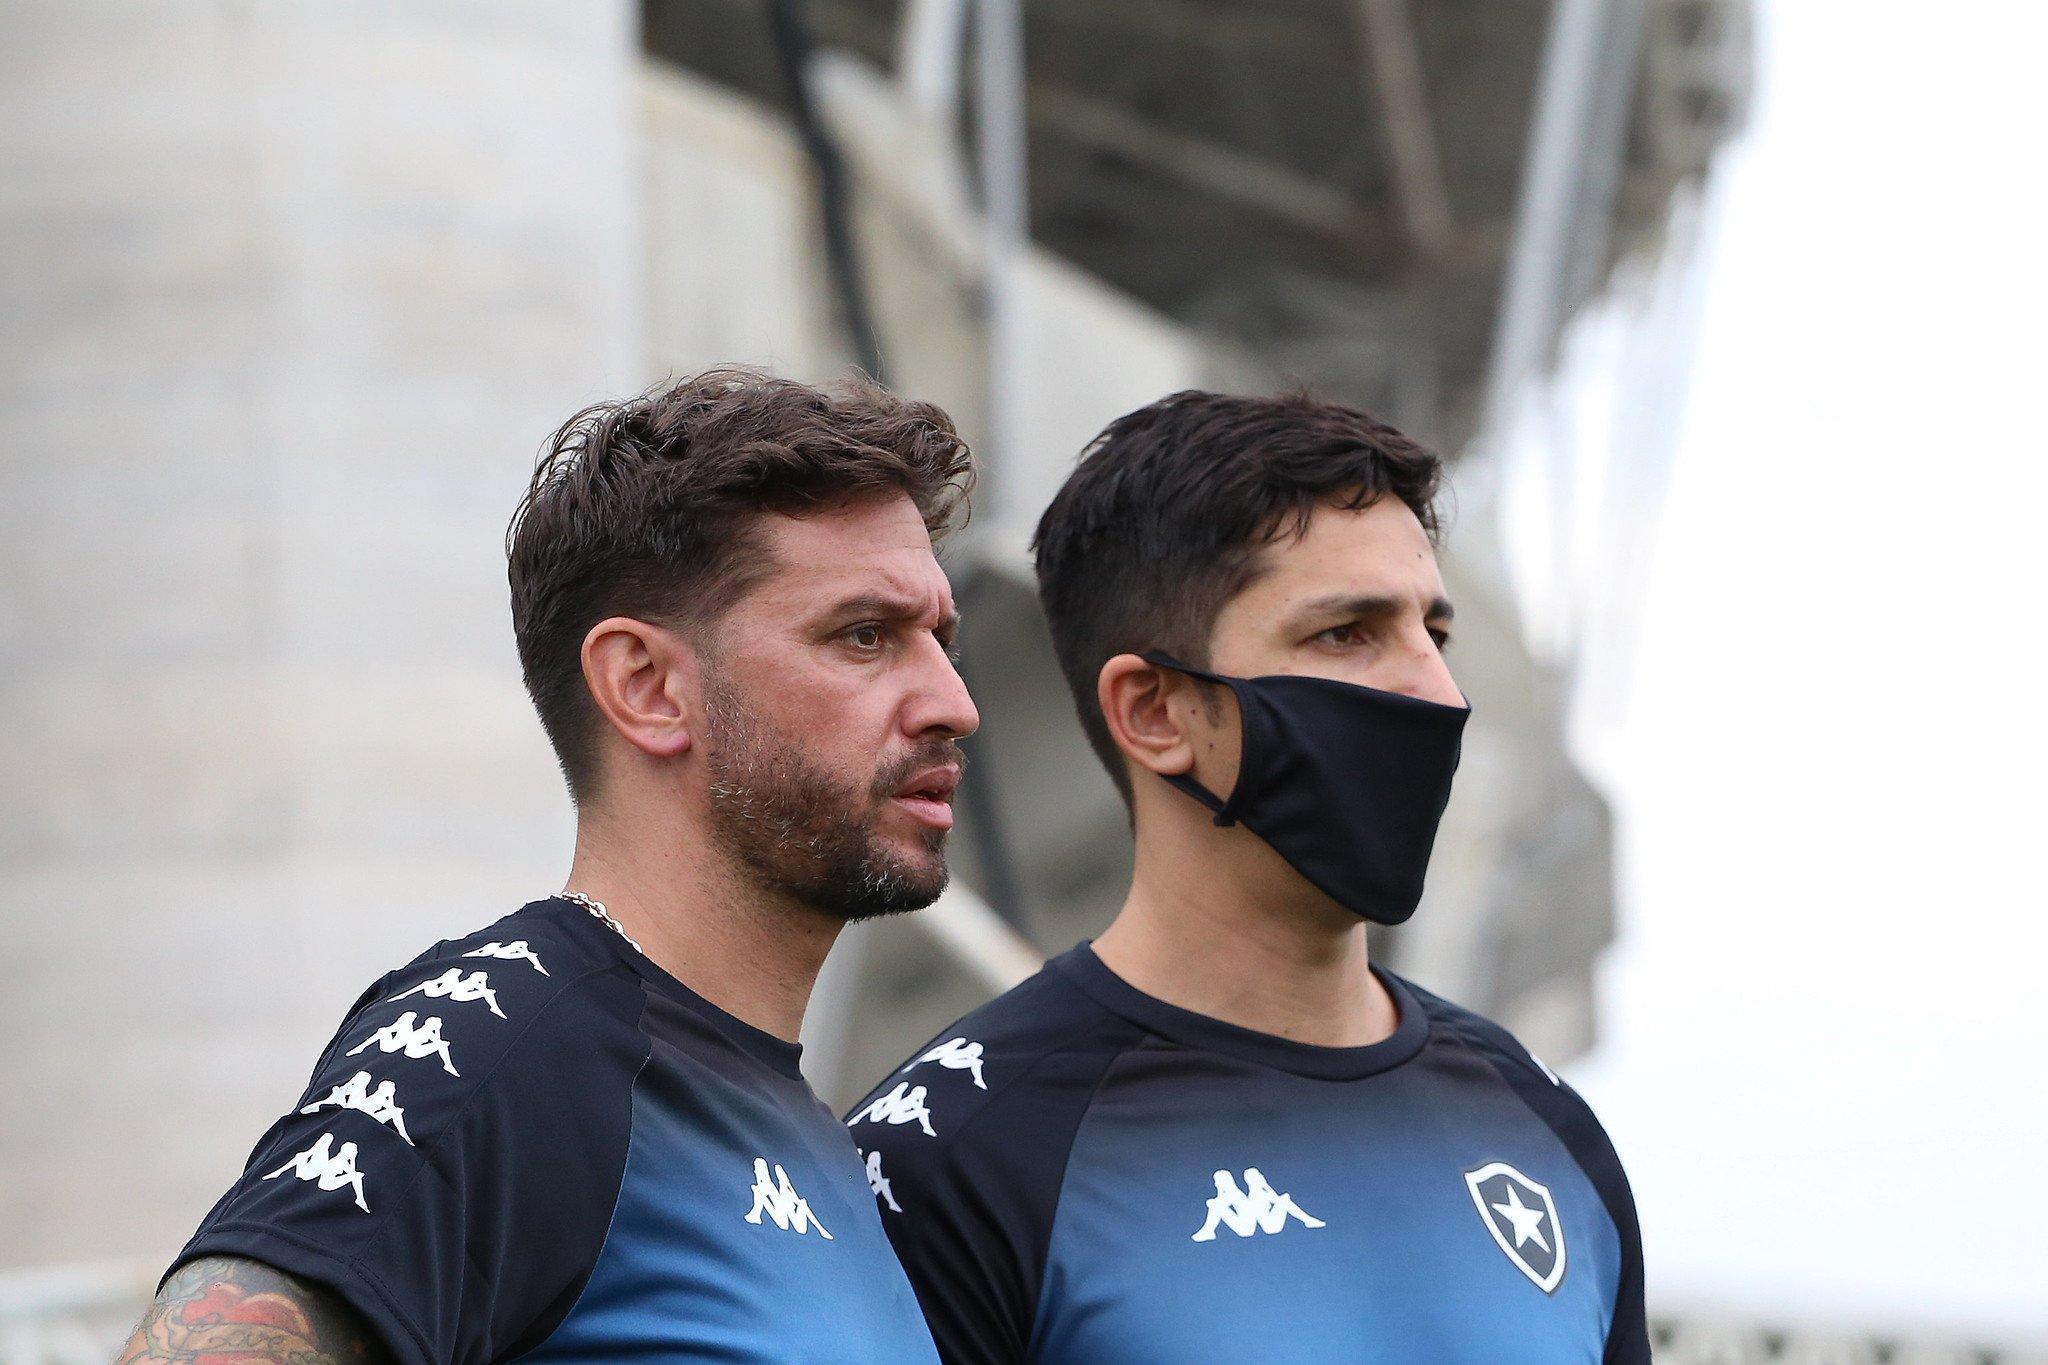 Osmar Ferreyra e Damián Paz - Botafogo